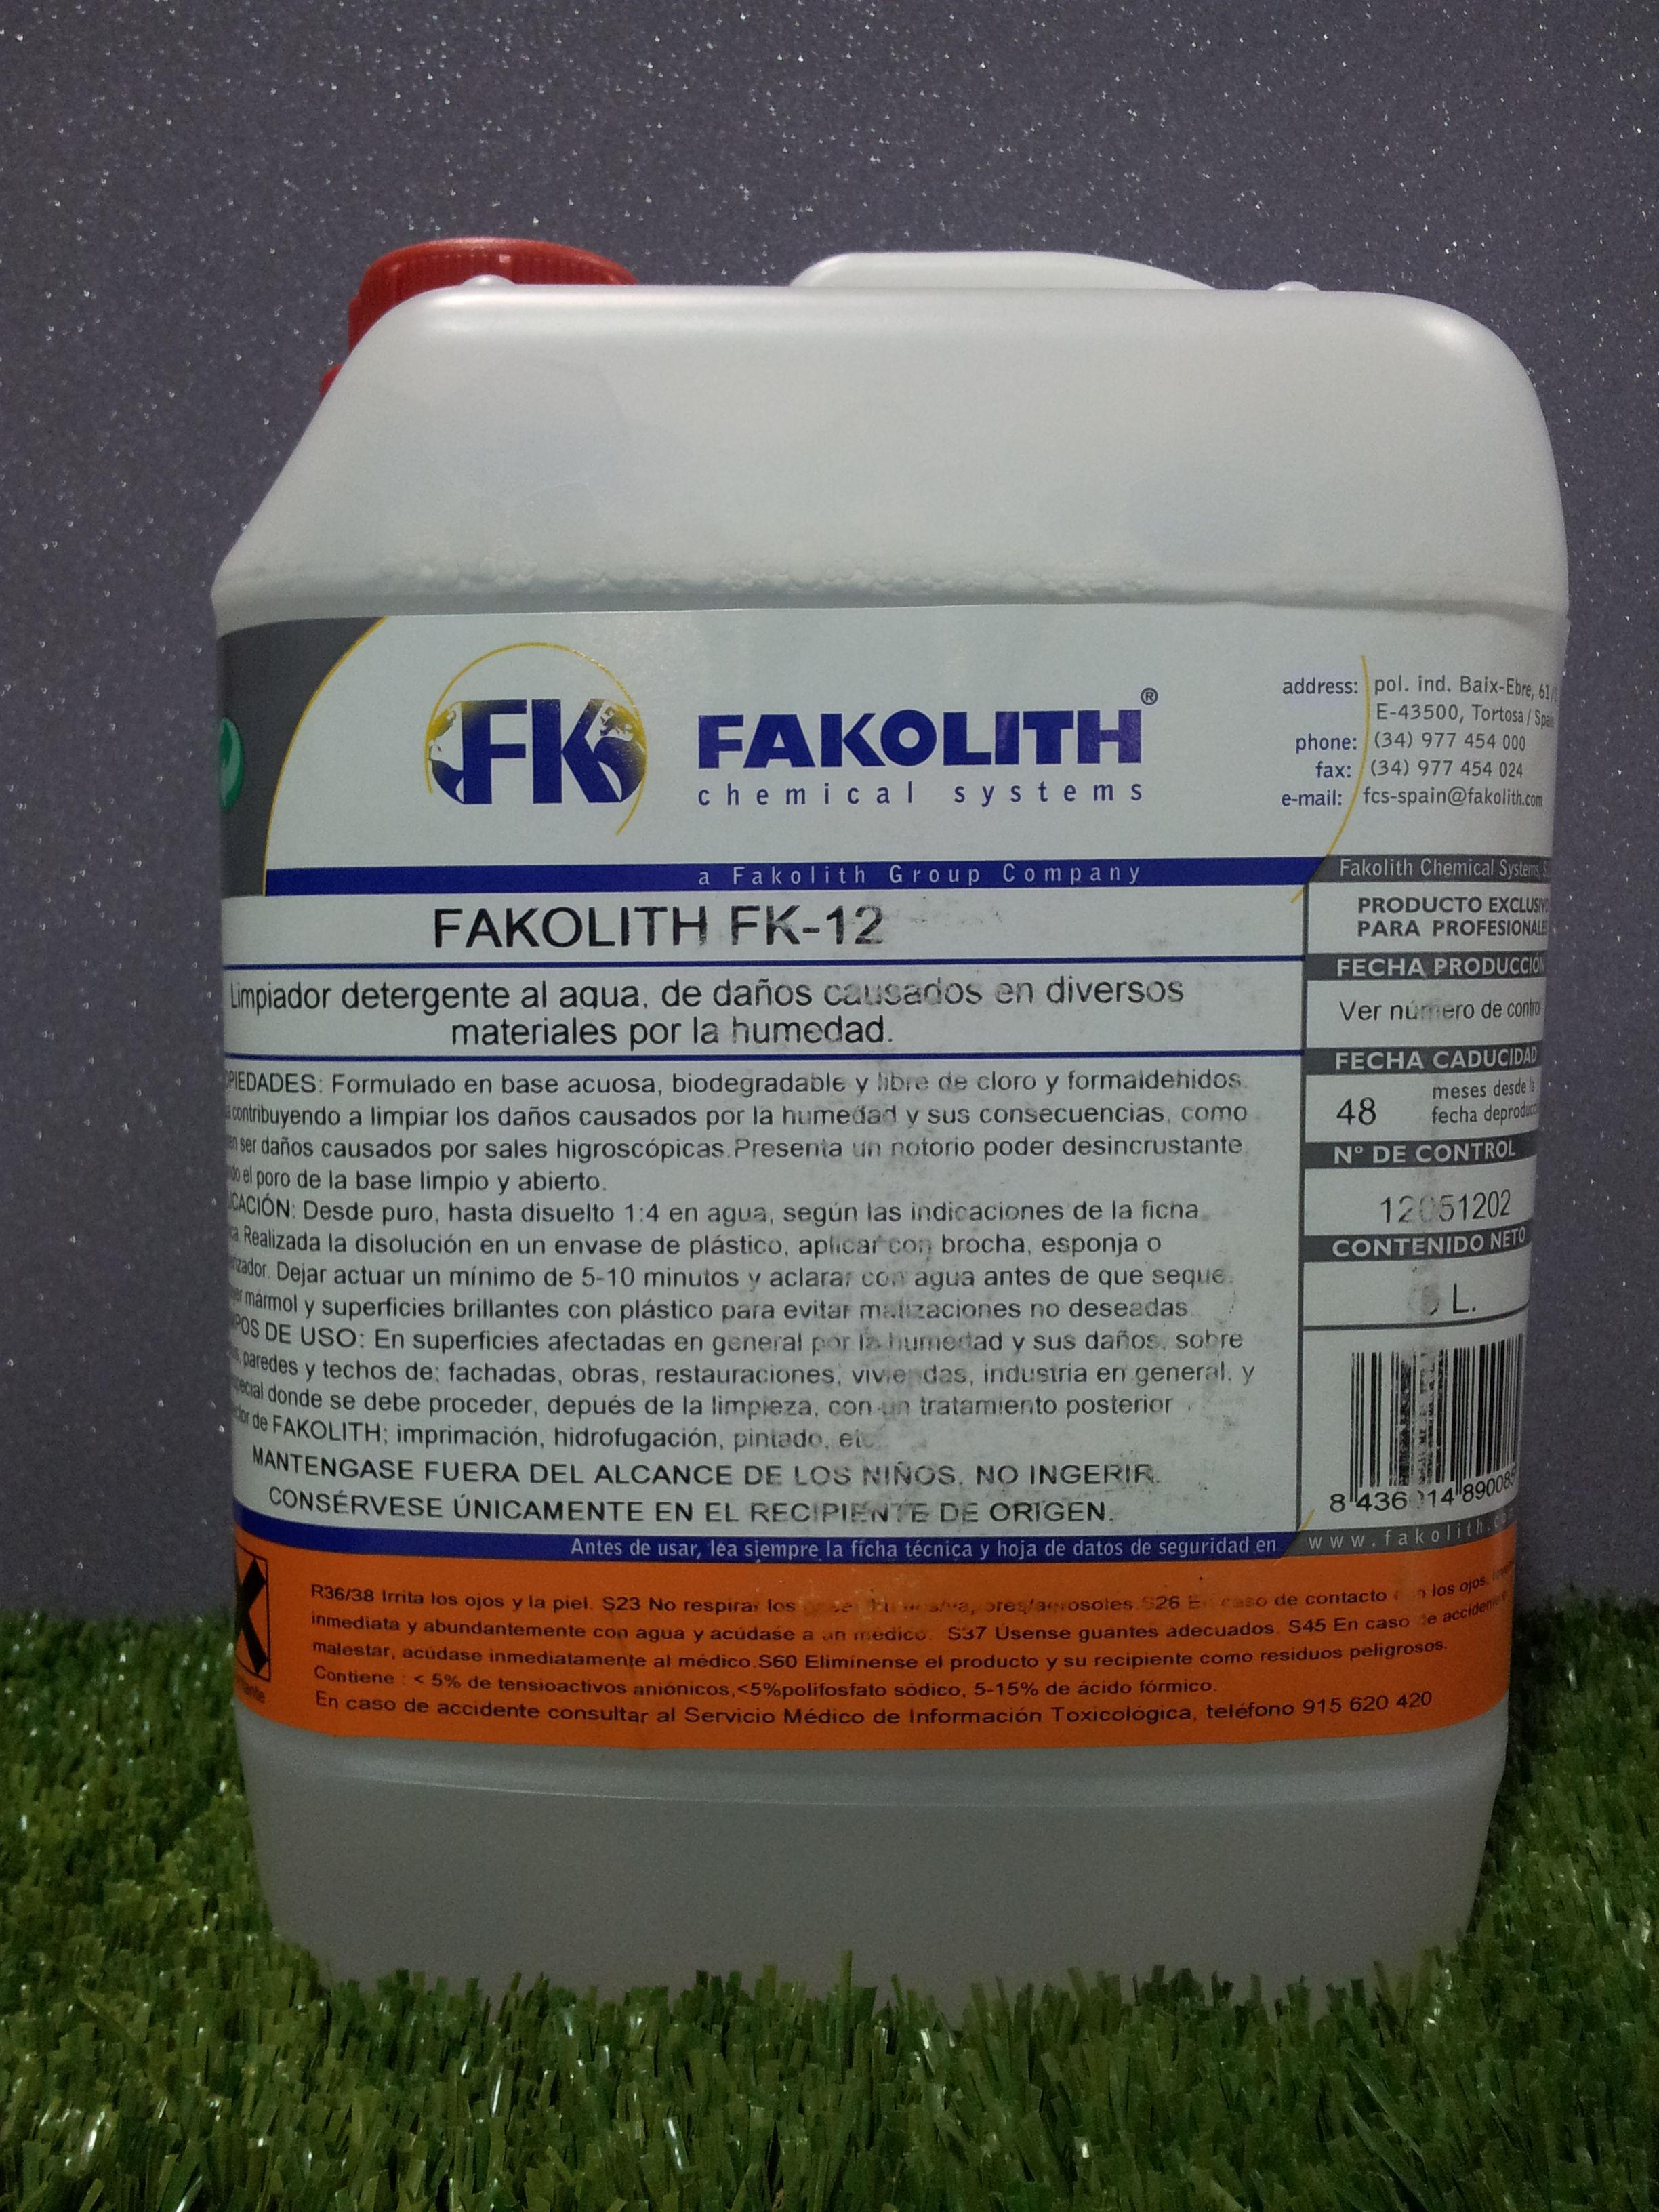 Fakolith FK-12